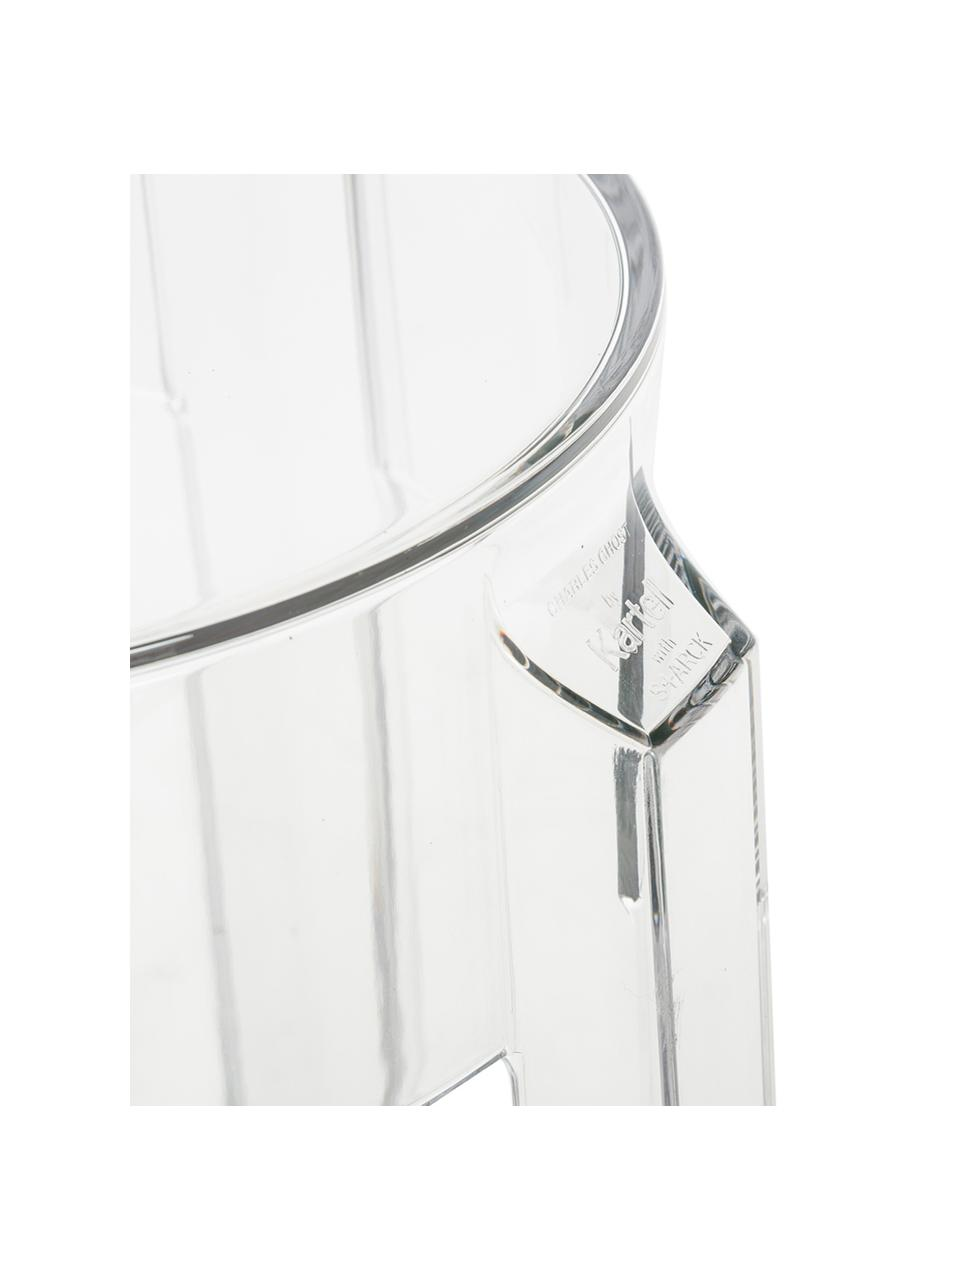 Stołek barowy  Ghost, Poliwęglan, Transparentny, Ø 46 x 75 cm